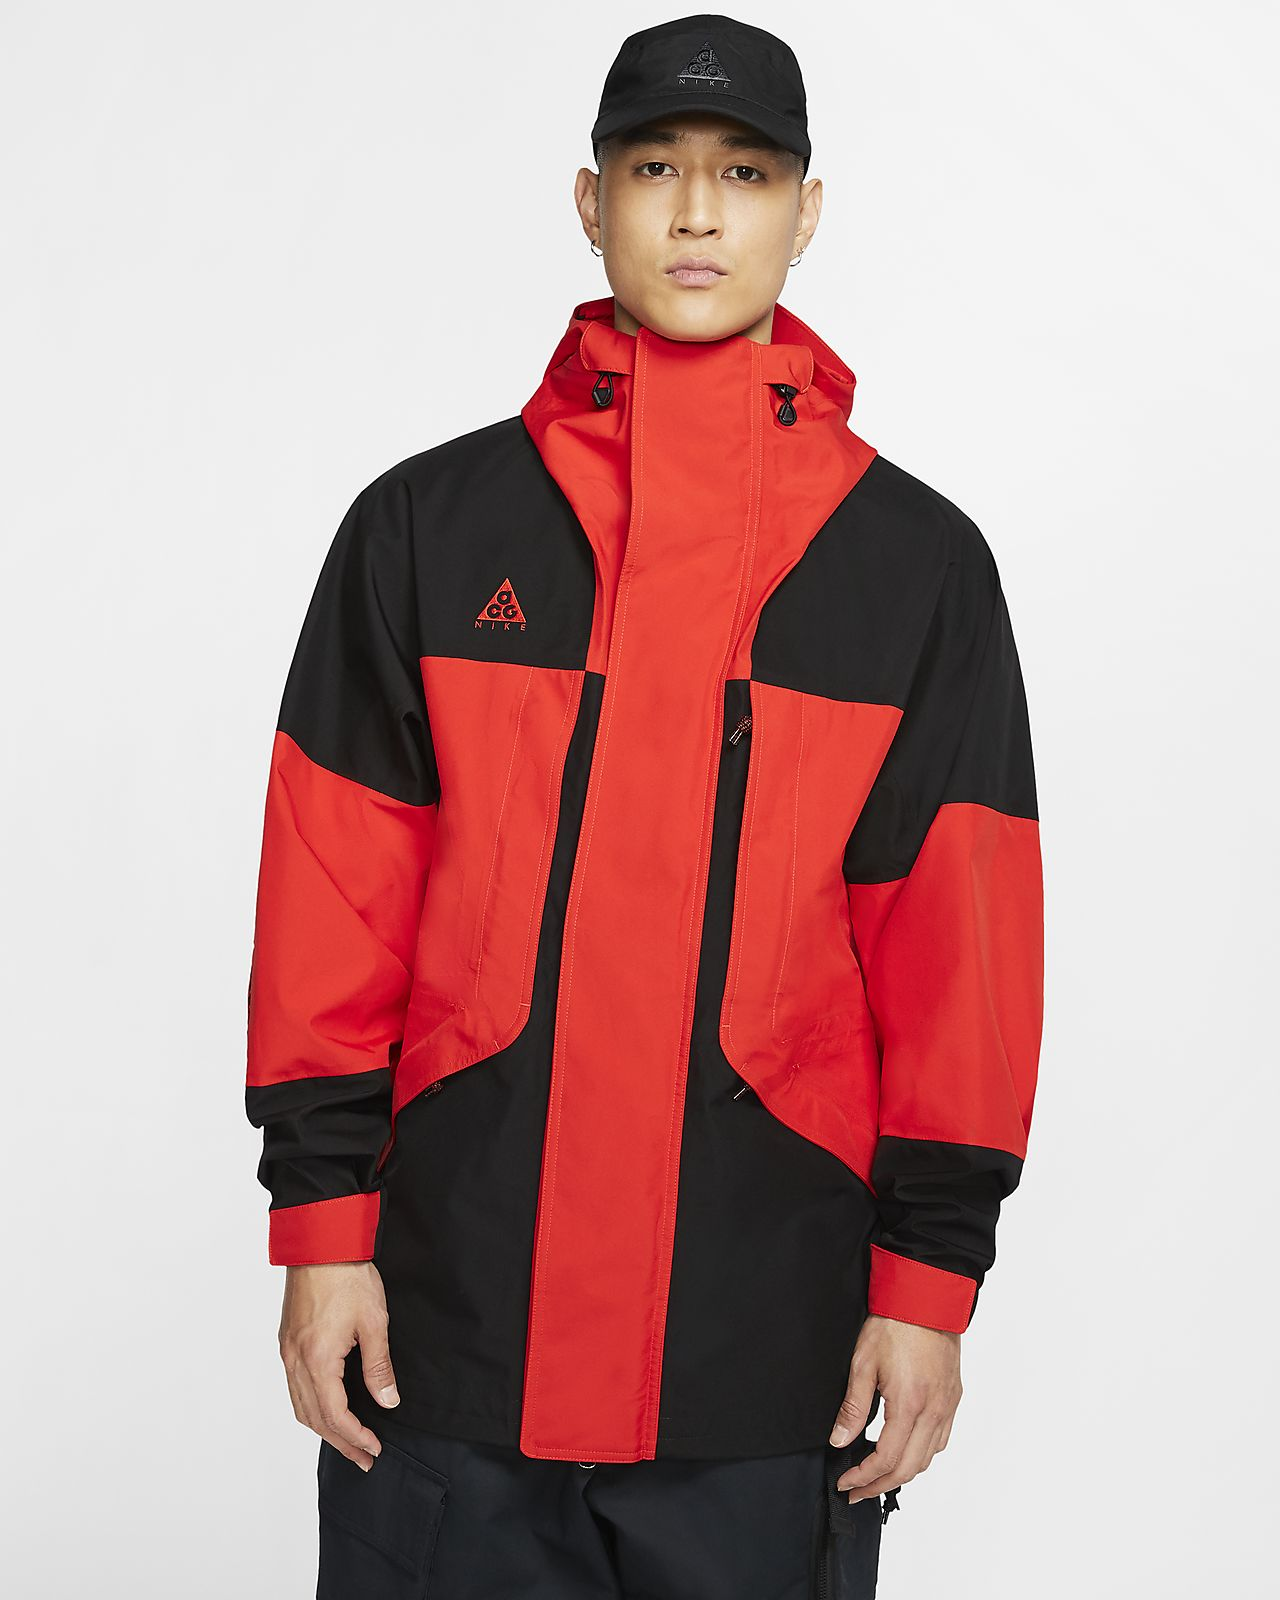 Nike ACG GORE-TEX Men's Jacket